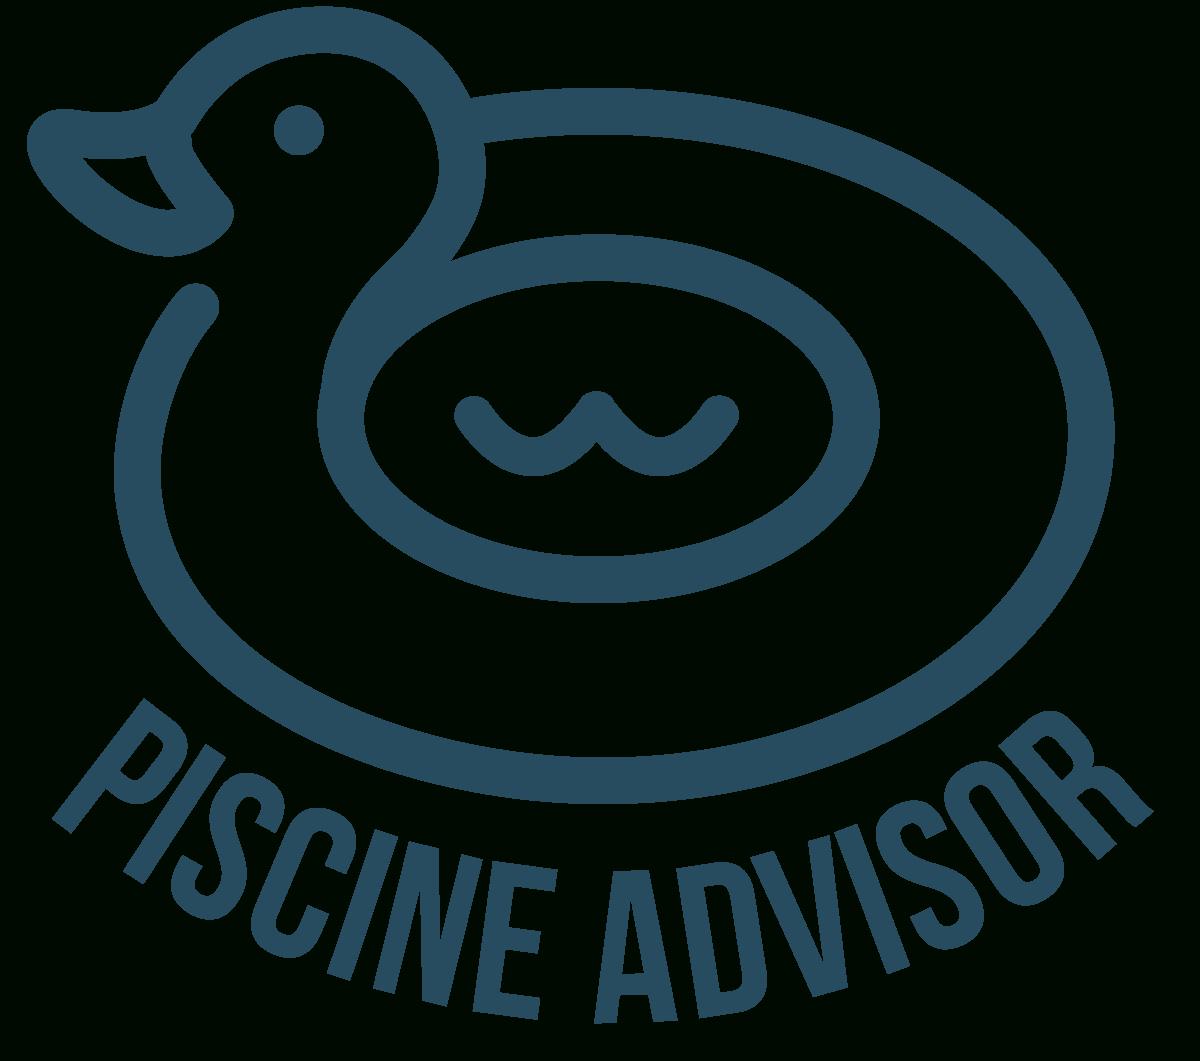 Sécurité Piscine Hors Sol: Guide Pratique - Piscine Advisor dedans Legislation Piscine Hors Sol